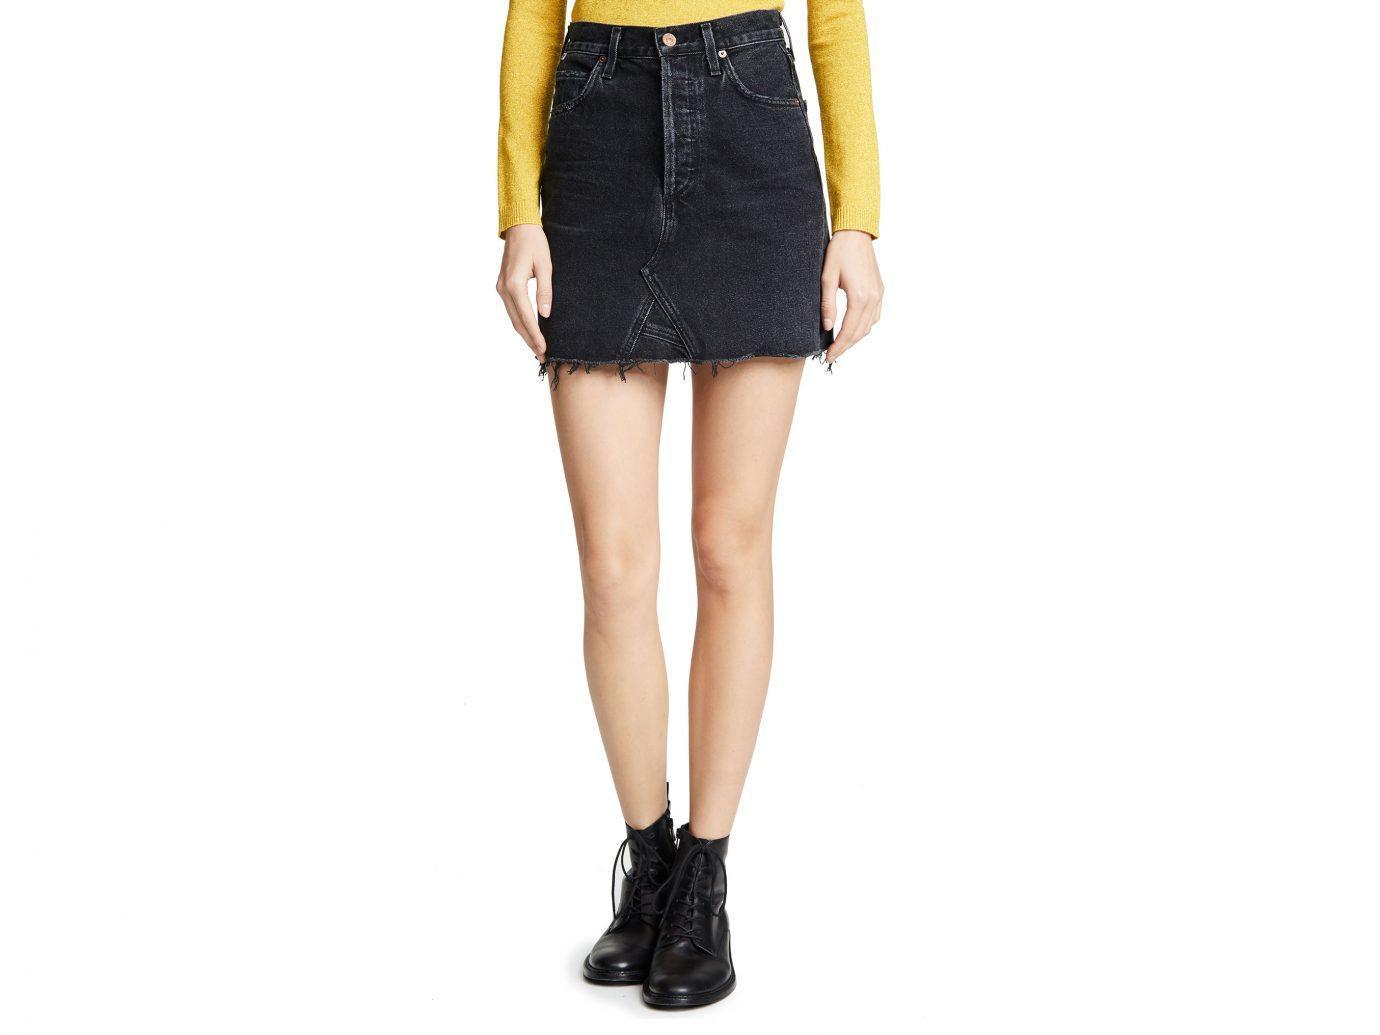 Citizens of Humanity Astrid Miniskirt